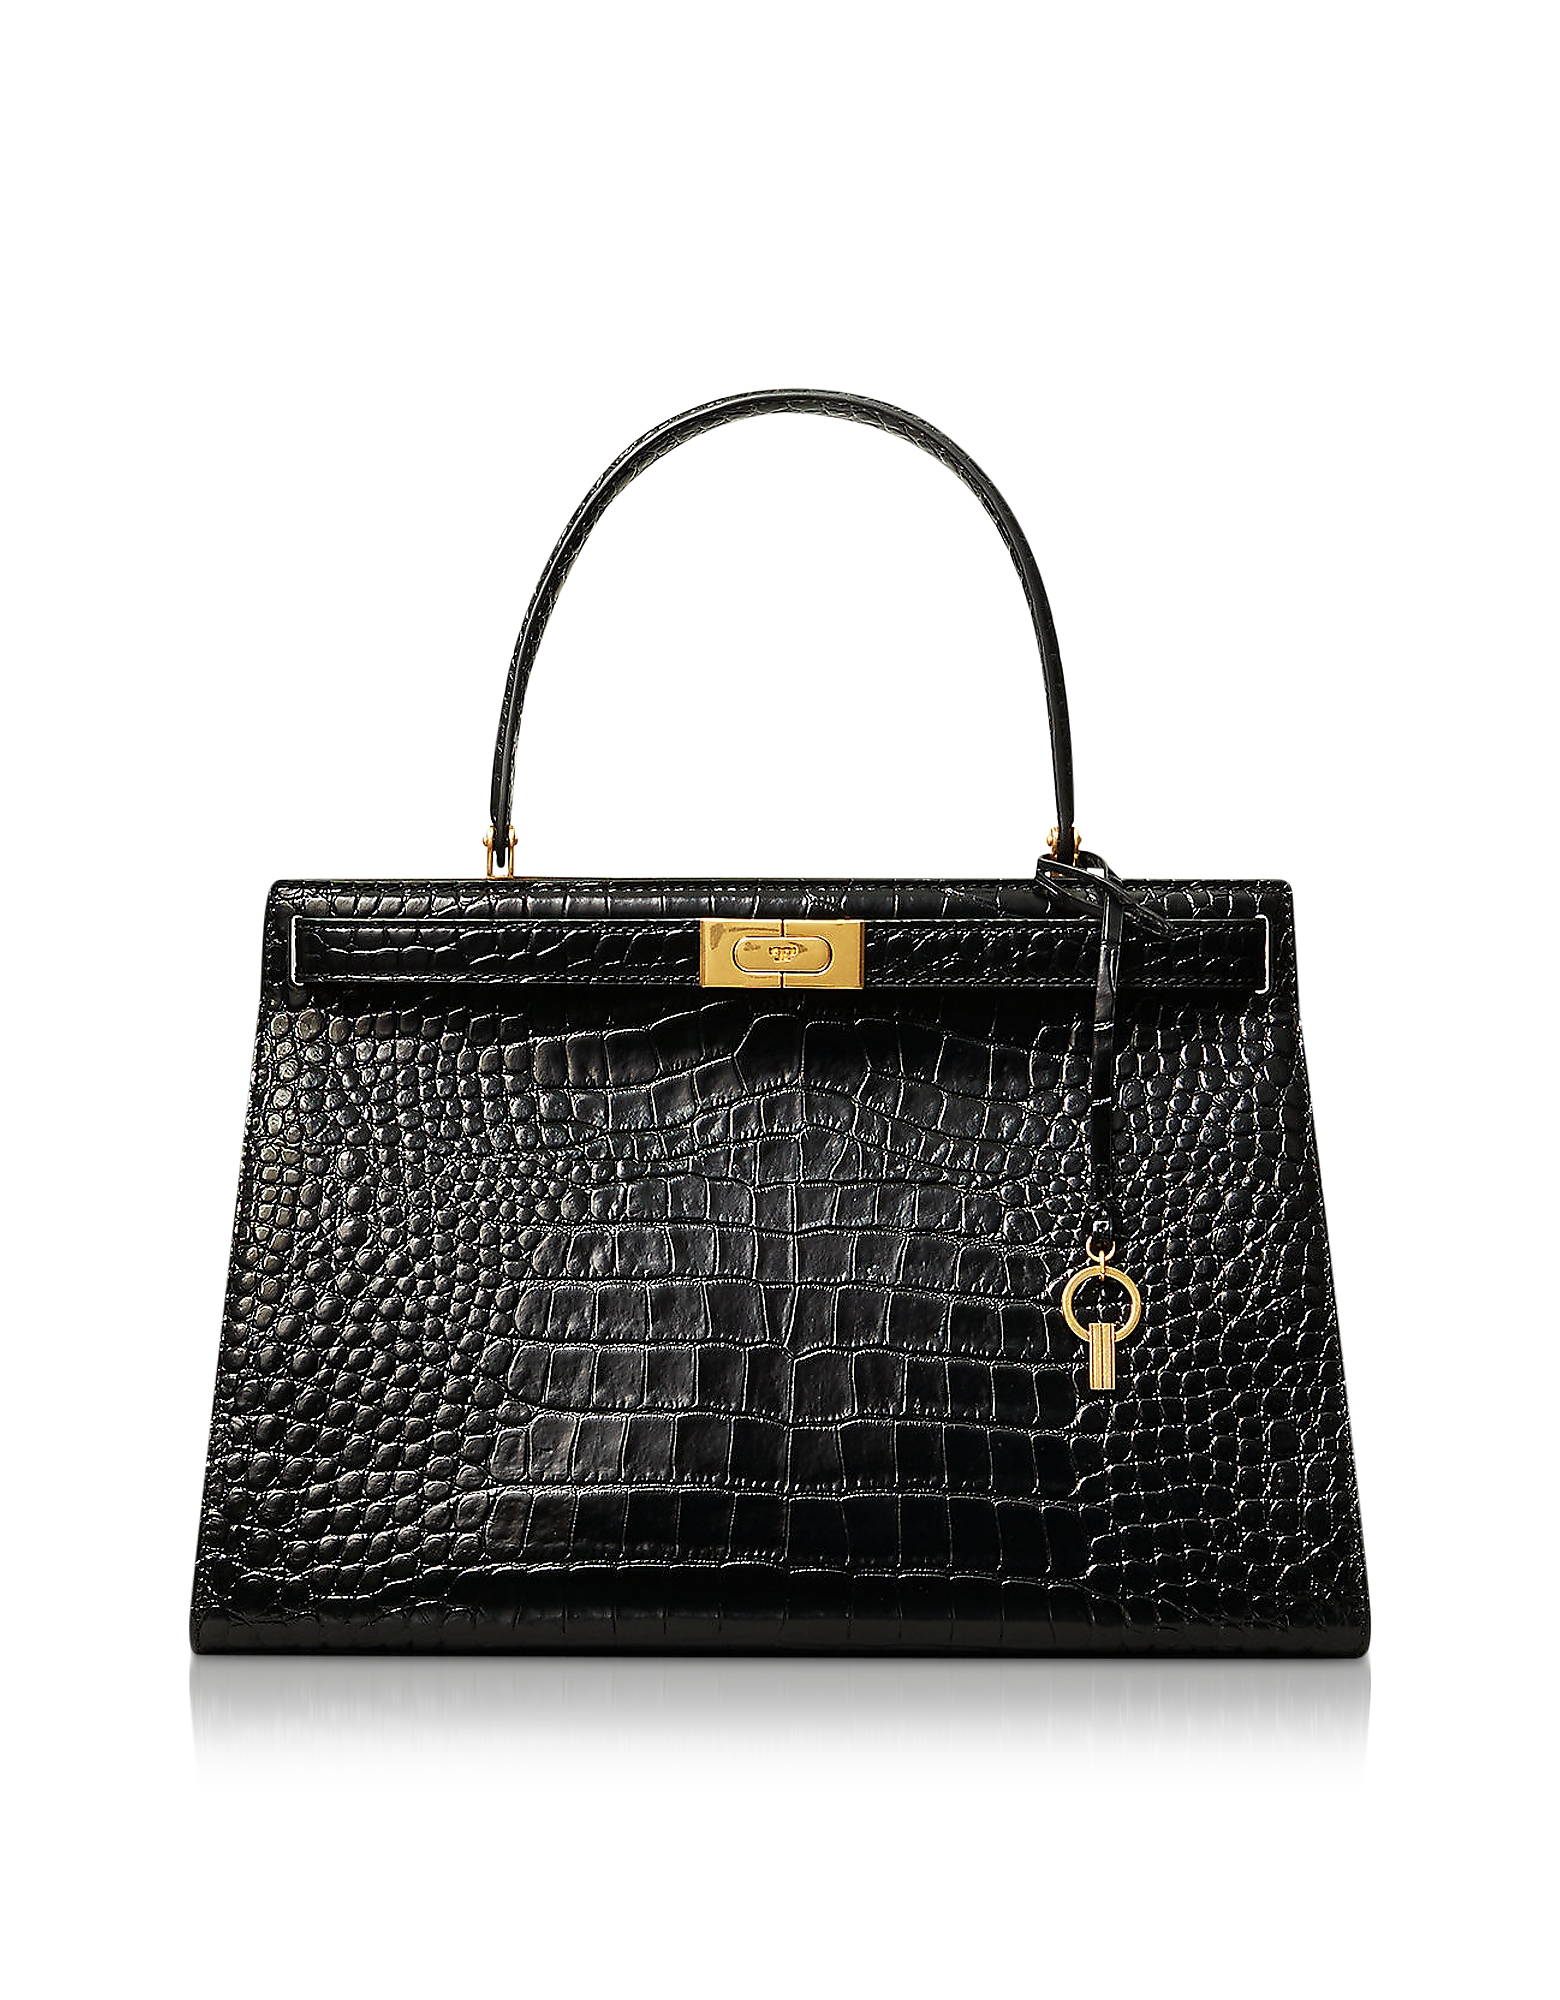 Black Lee Radziwill Top Handle Bag